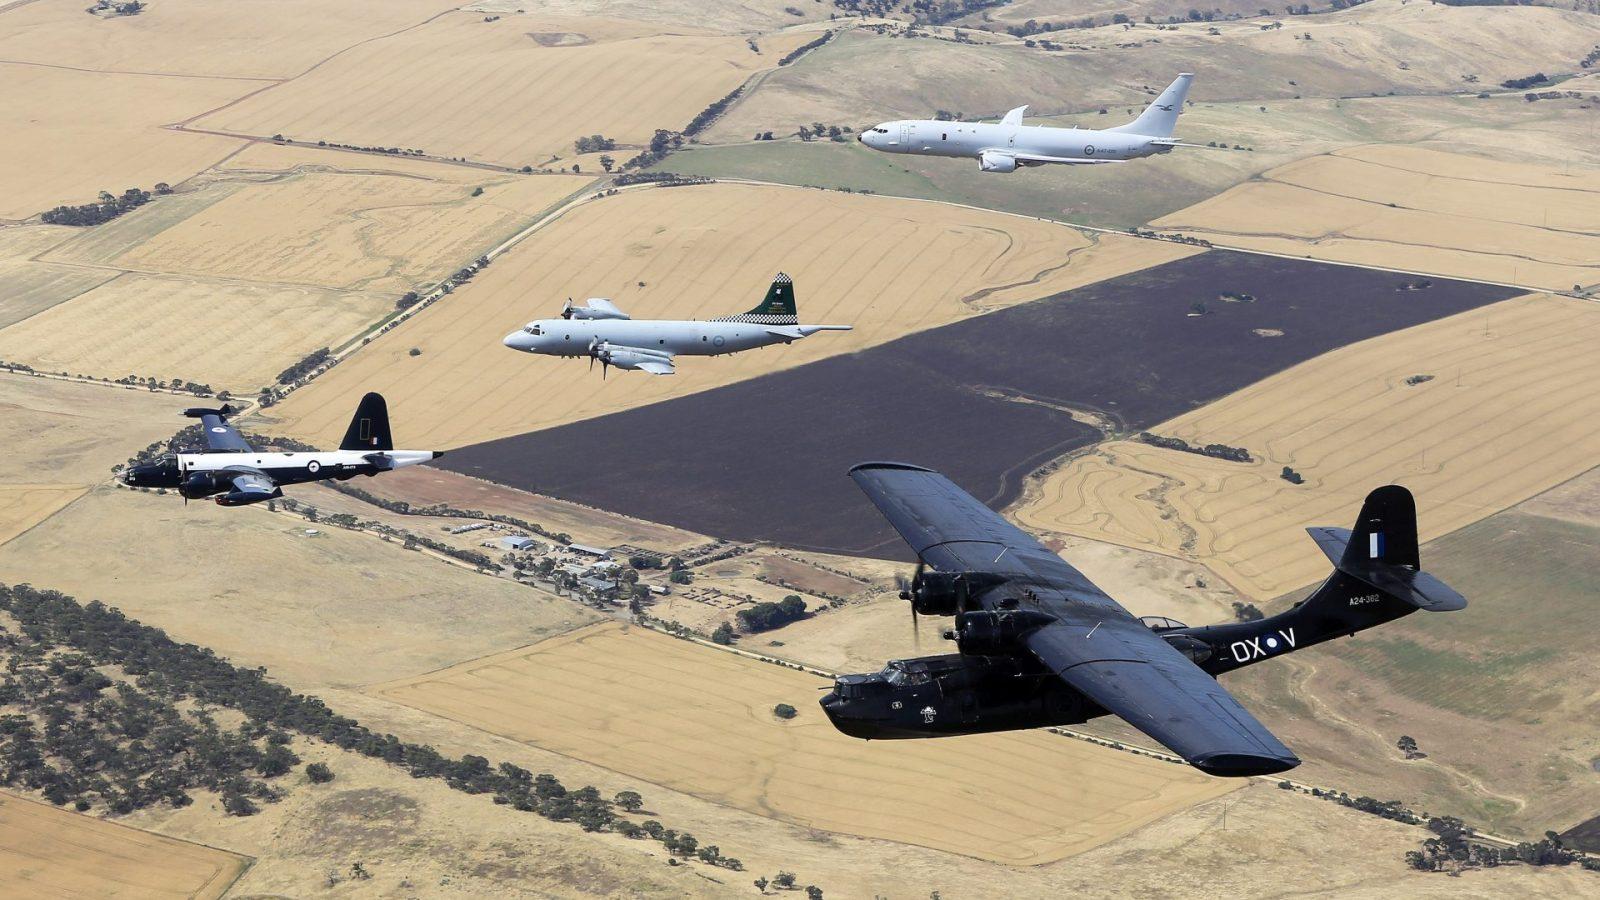 Royal Australian Air Force; Aircraft; A47 P-8A Poseidon; A9 AP-3C Orion; Out of Service; Royal Australian Air Force Aircraft; Second Series 1935-1960; A24 CATALINA; A89 LOCKHEED NEPTUNE;